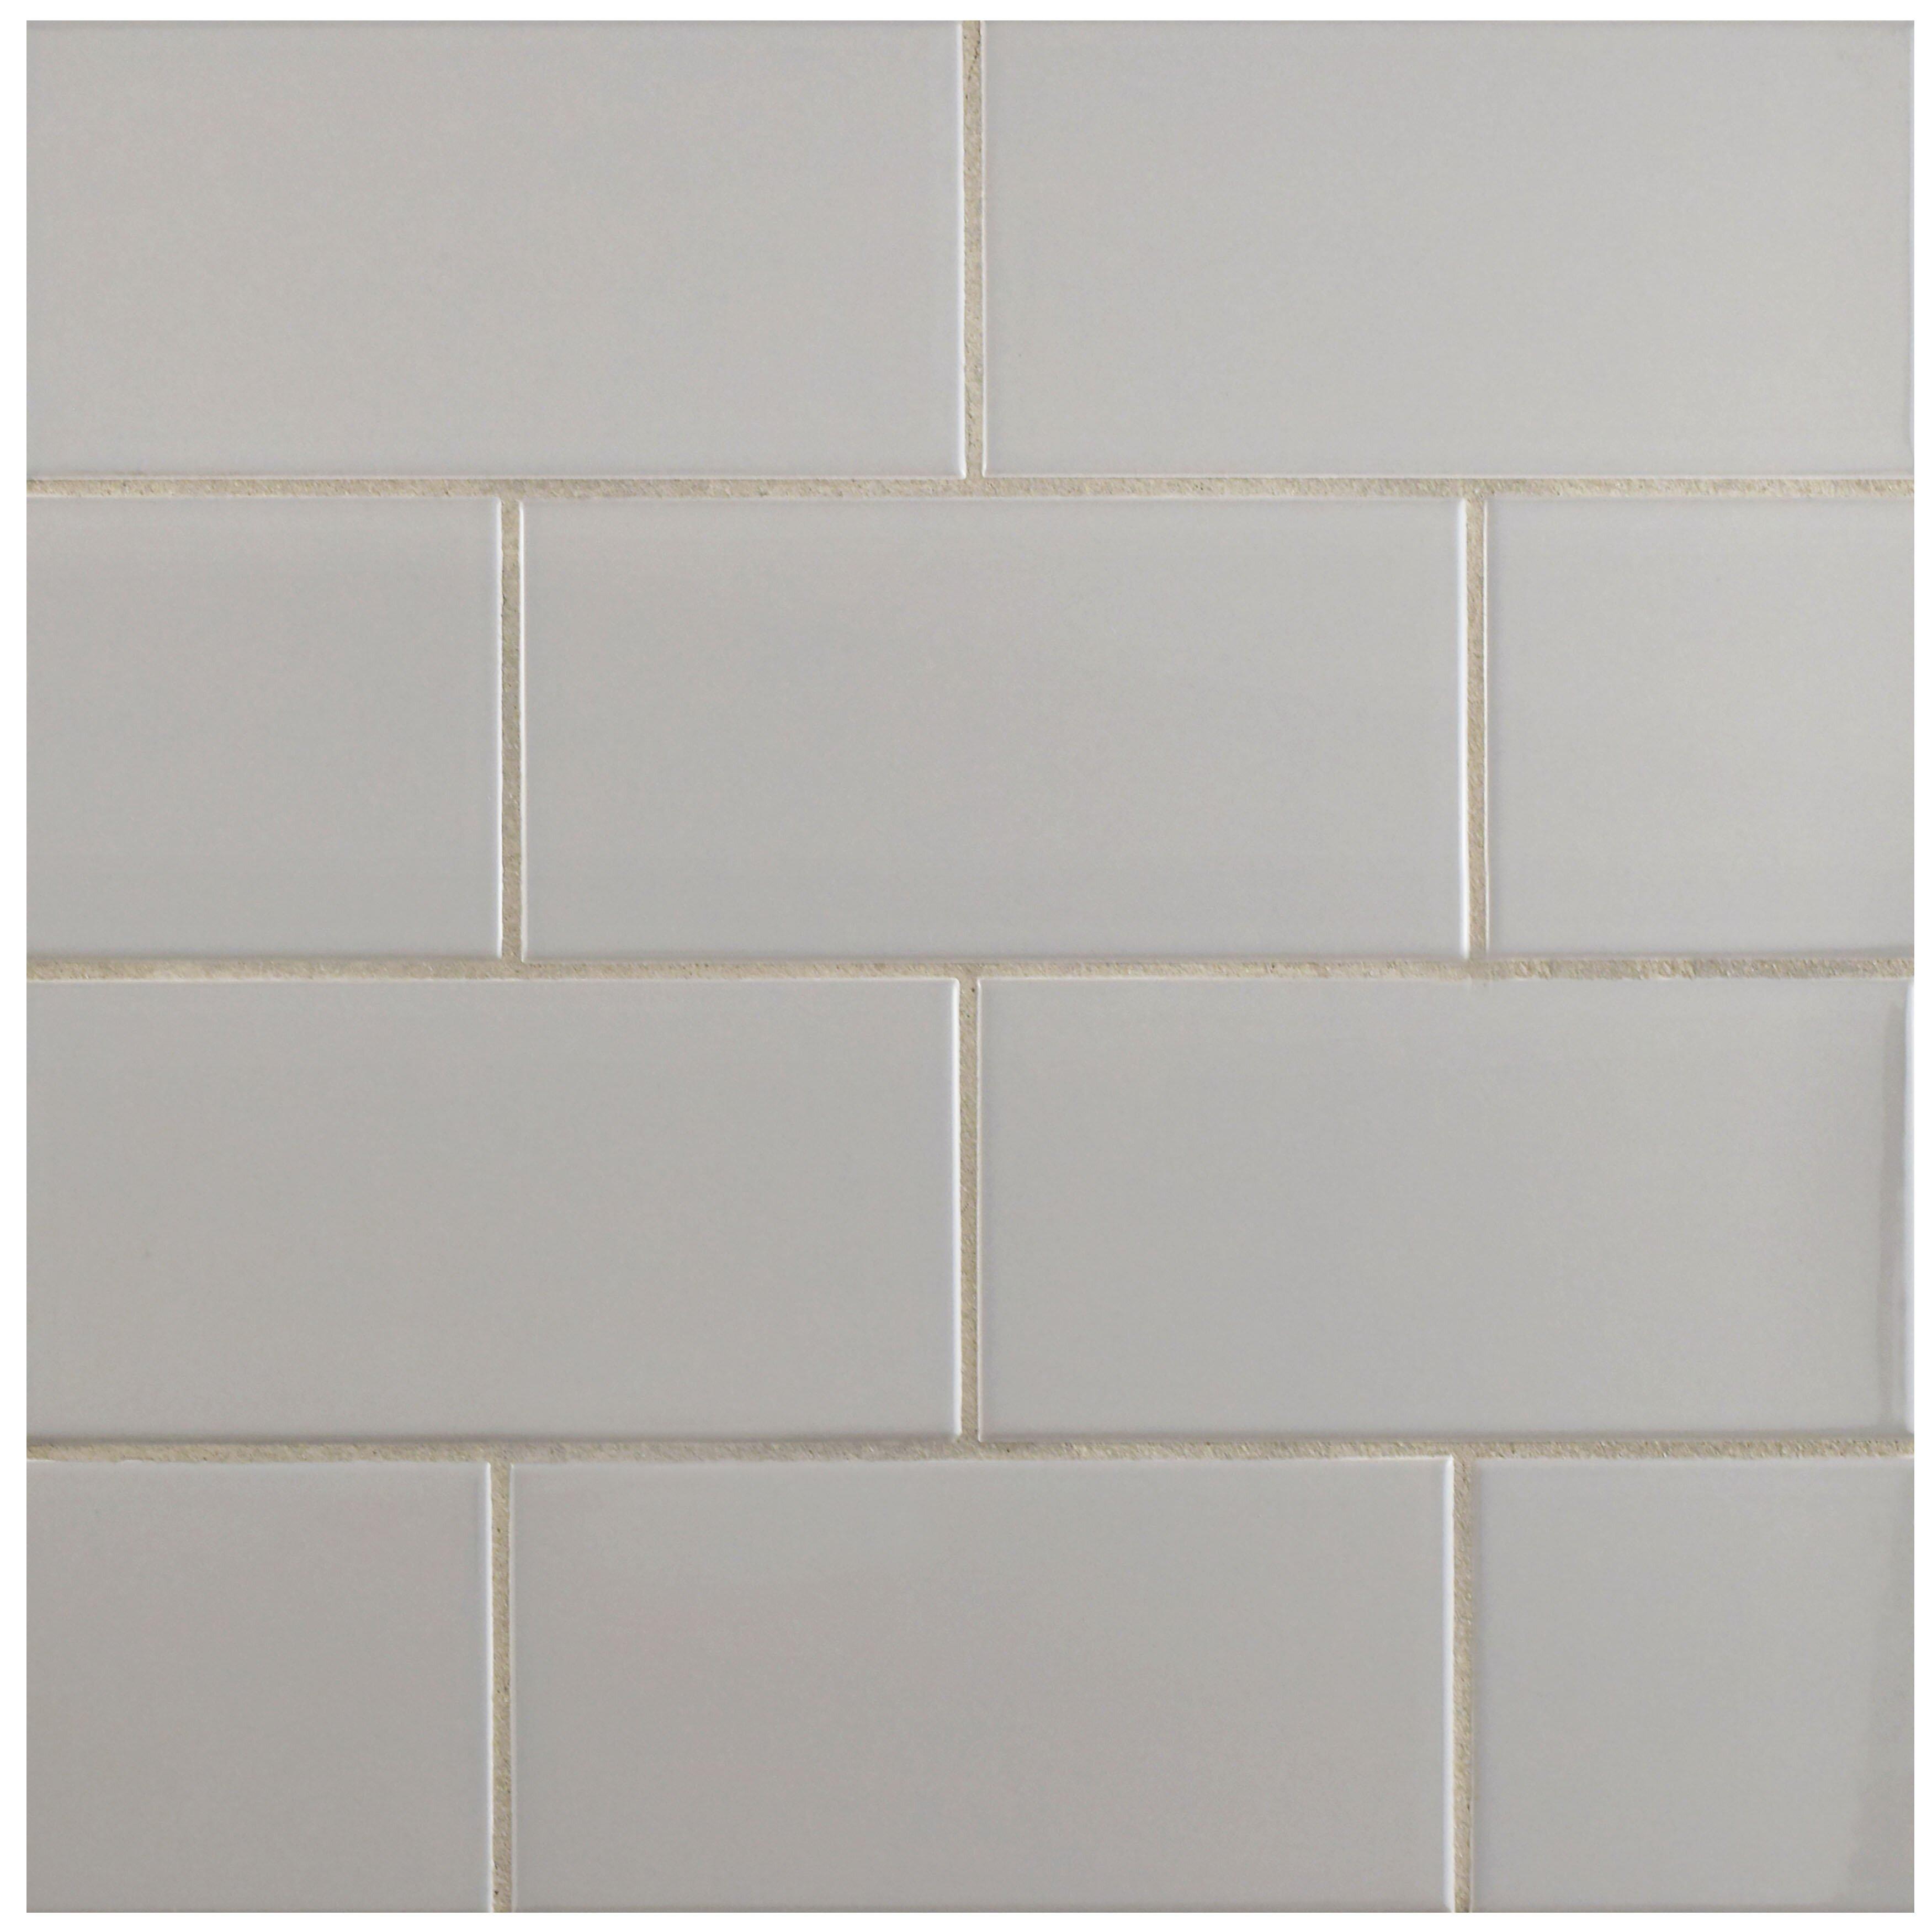 Elitetile Prospect 3 X 6 Ceramic Subway Tile In Gray Reviews Wayfair